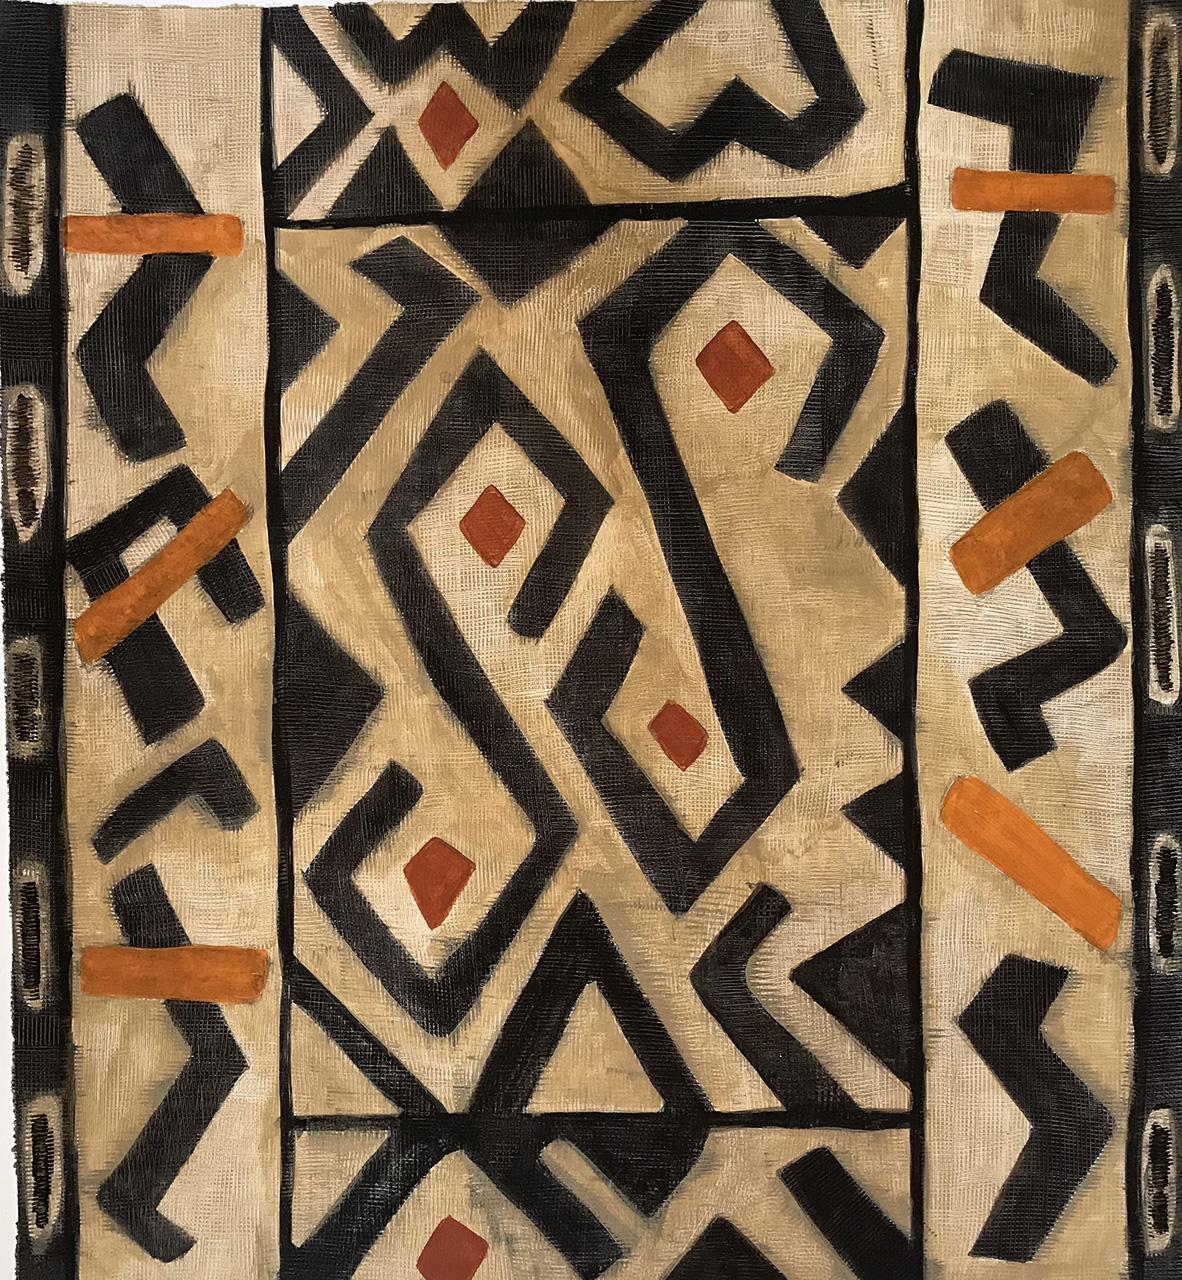 Shamwari-Sindile guest villa -Illustration Kuba cloth for KM2K Design by Louise Hennigs